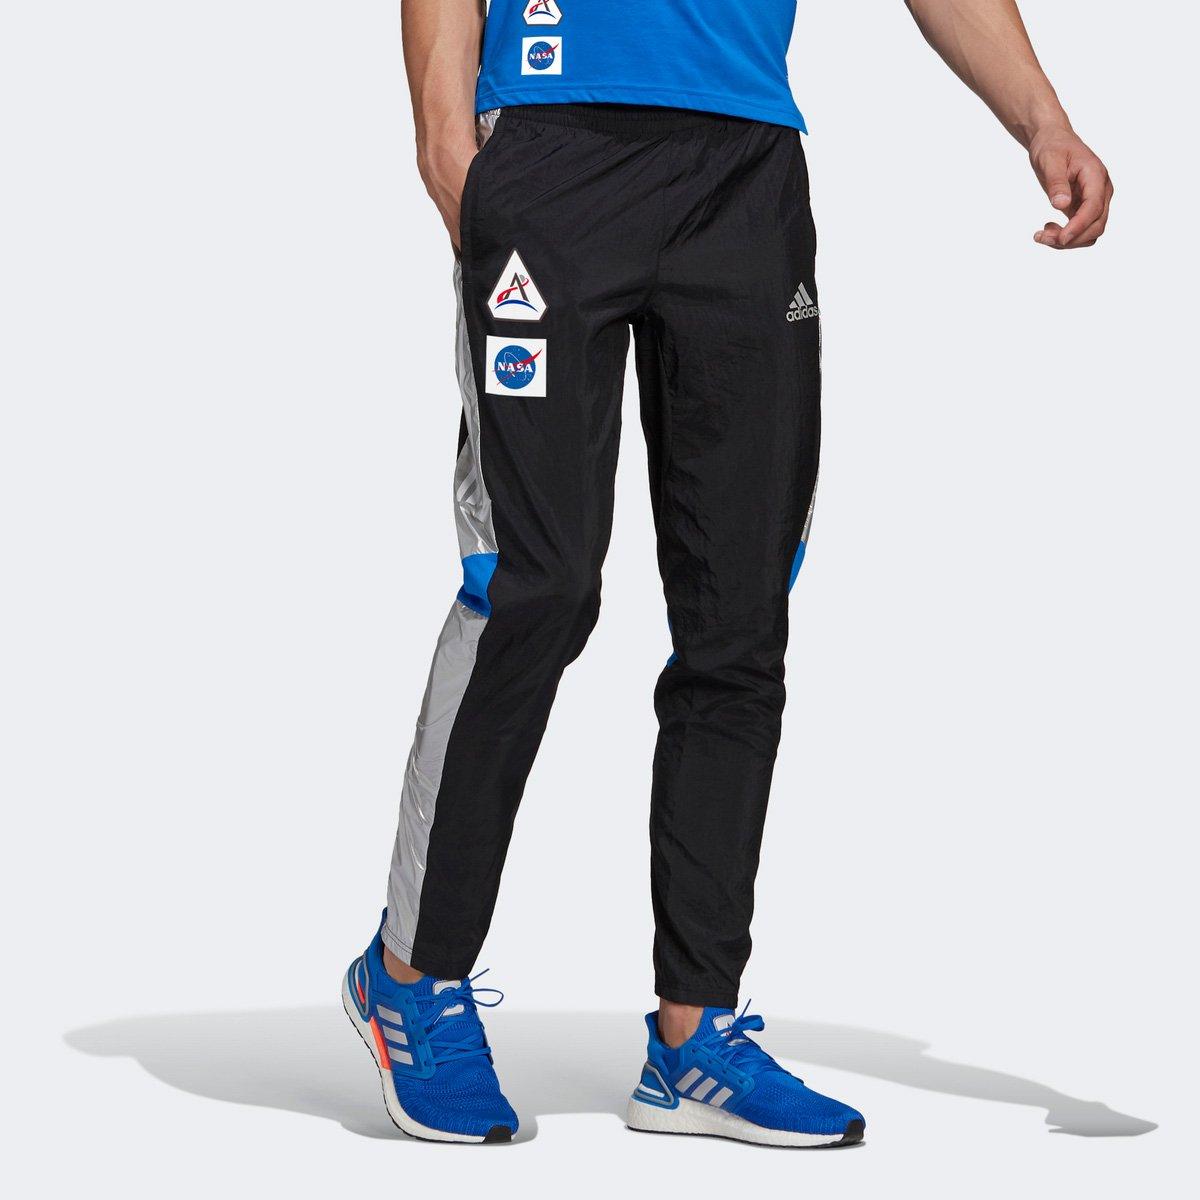 Calça Adidas Own The Run Space Race Masculina